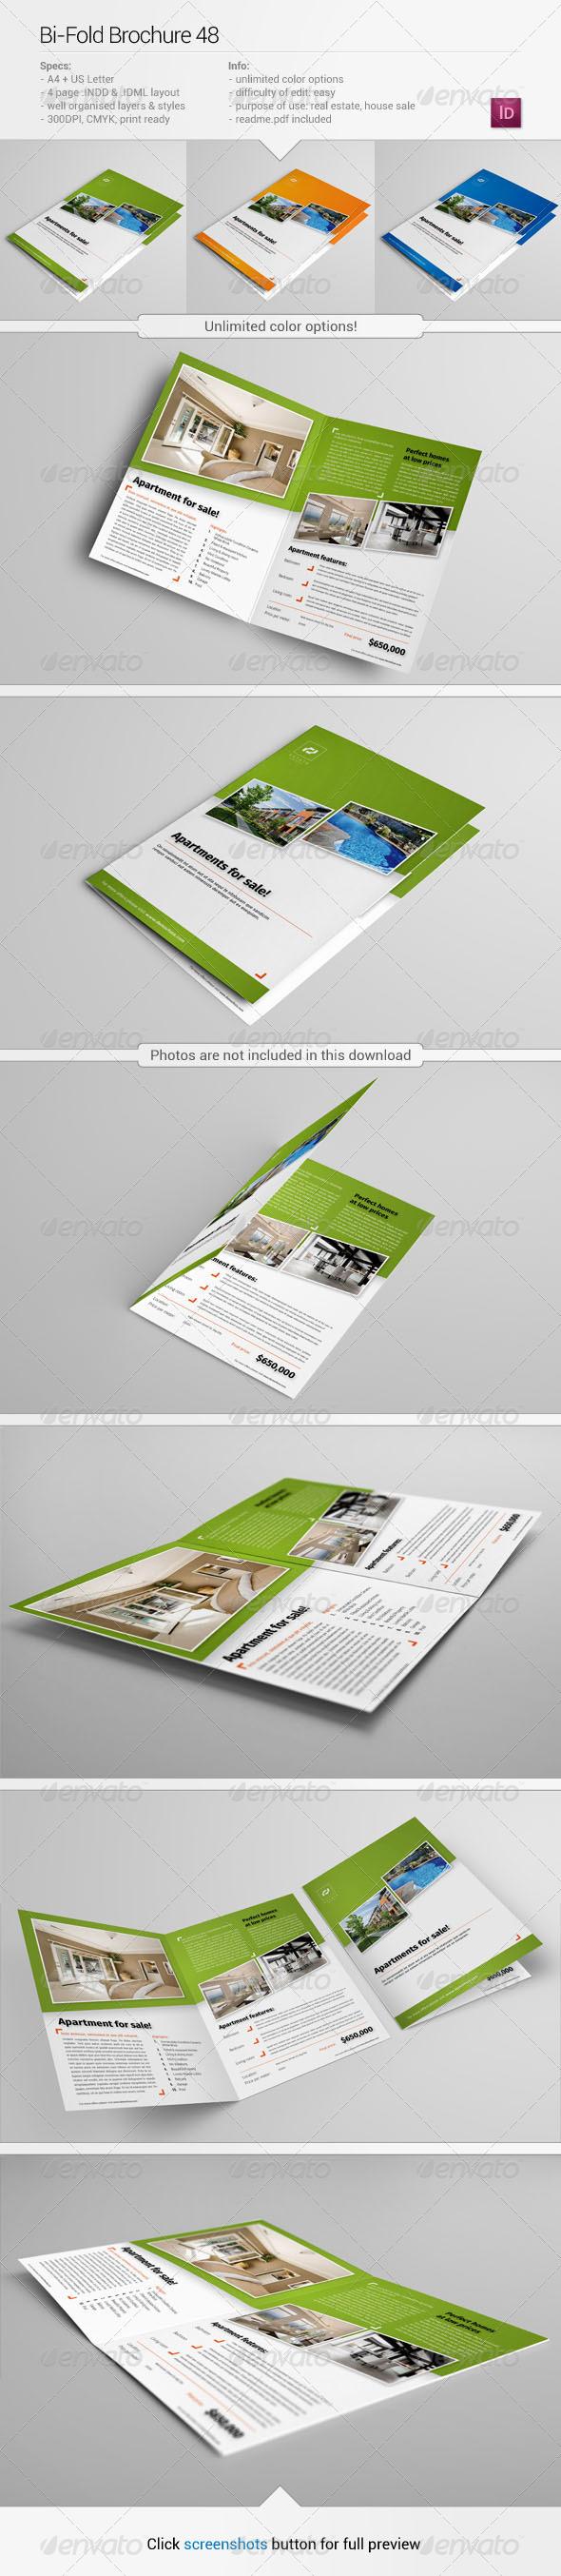 Bi-Fold Brochure 48 - Informational Brochures